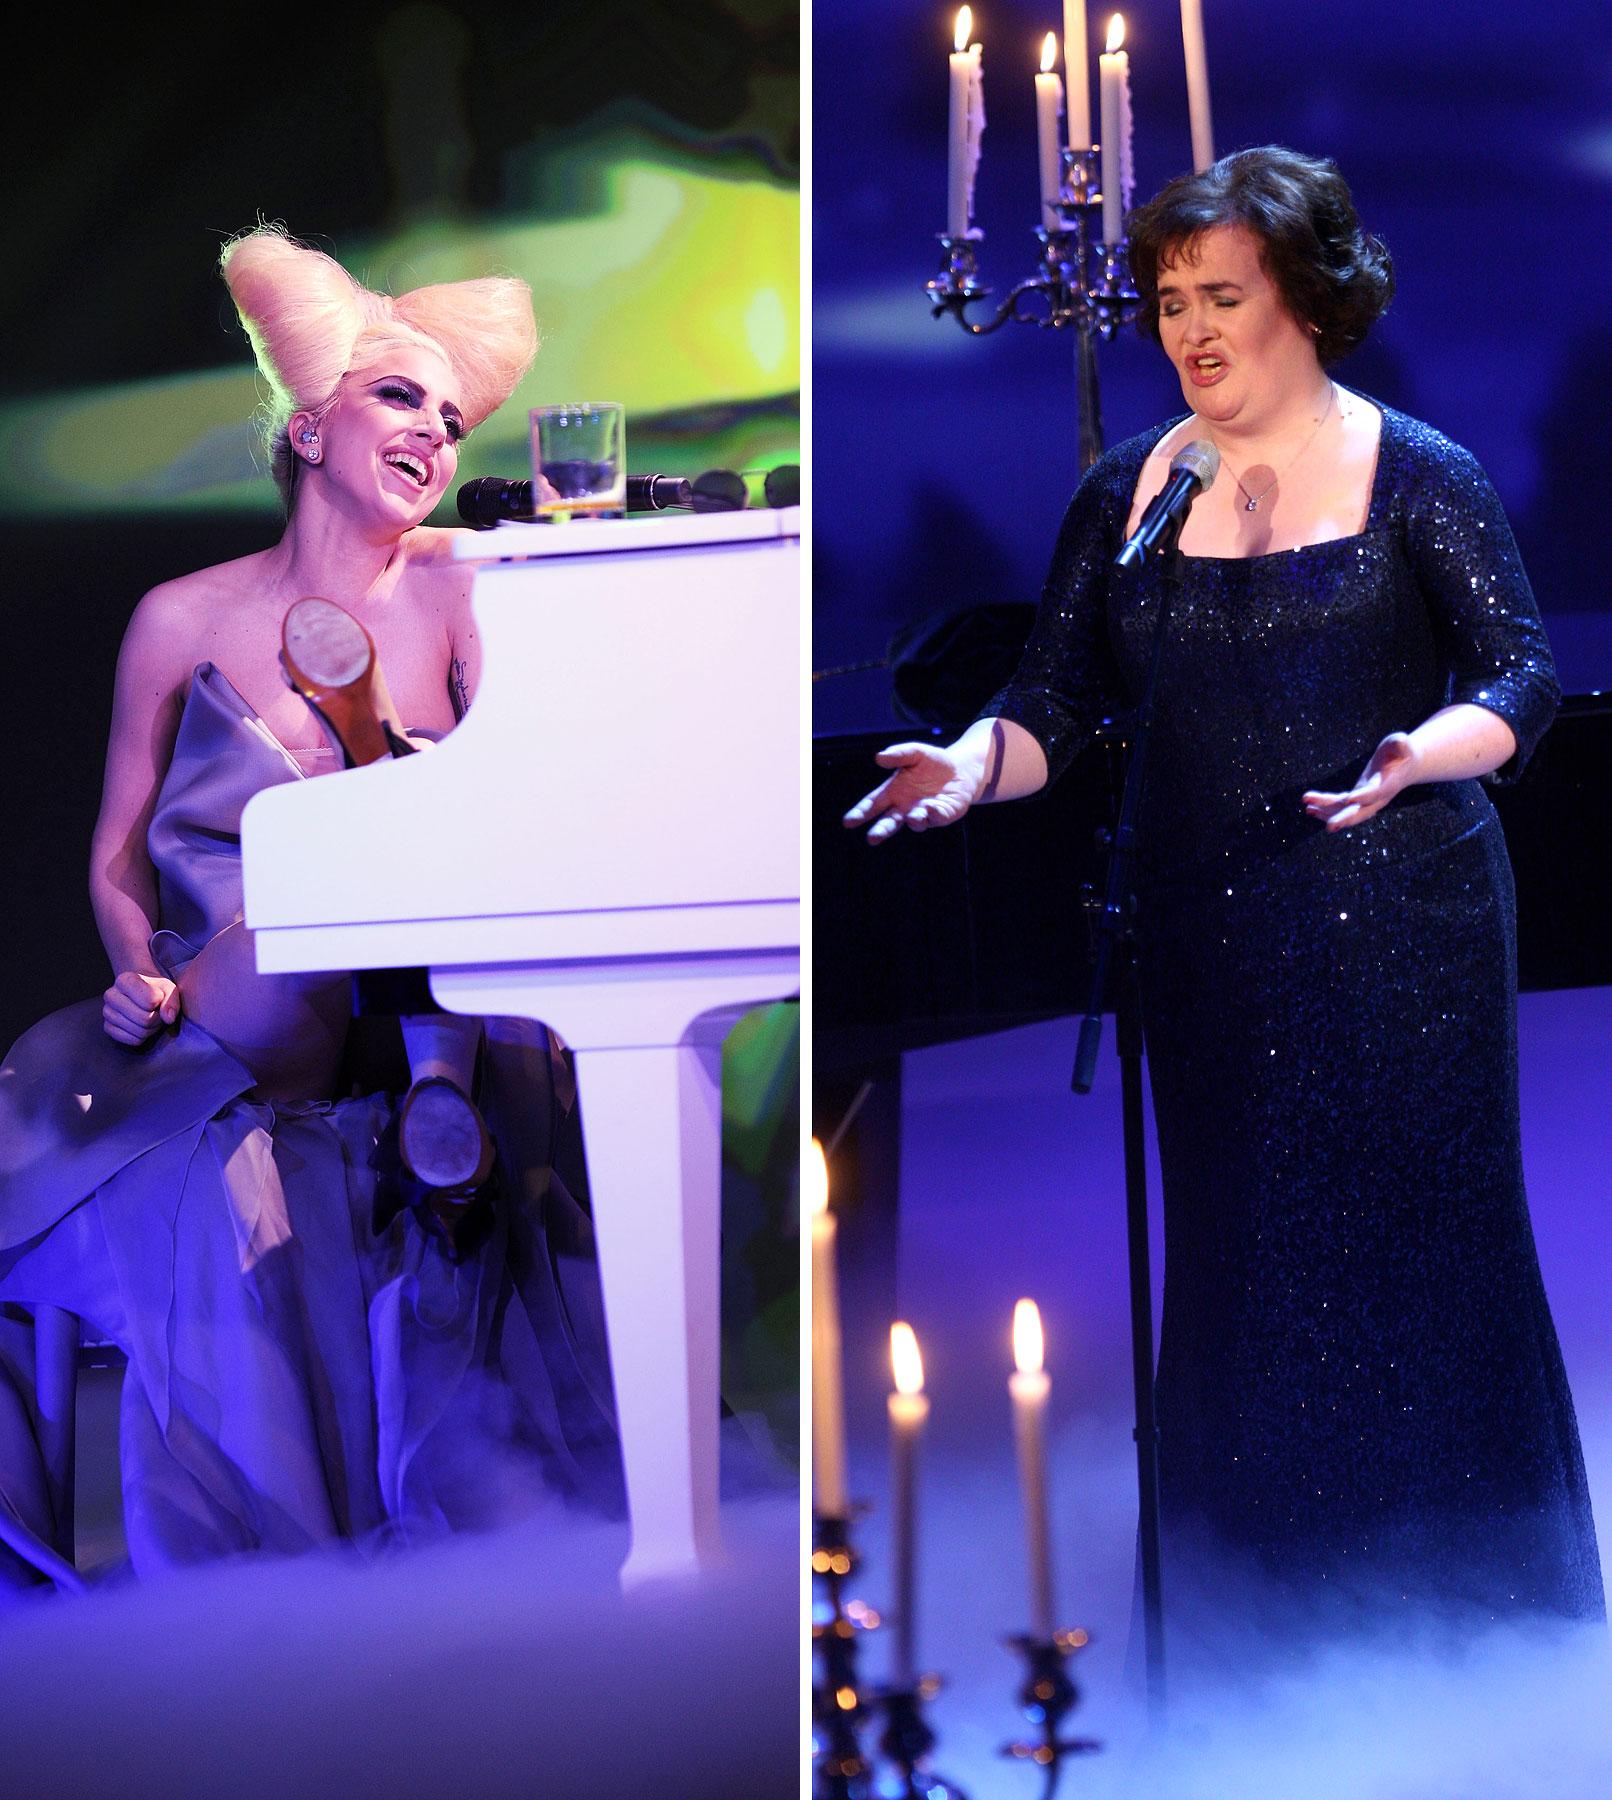 GaGa Goes Gaga Over SuBo, Potential Duo?